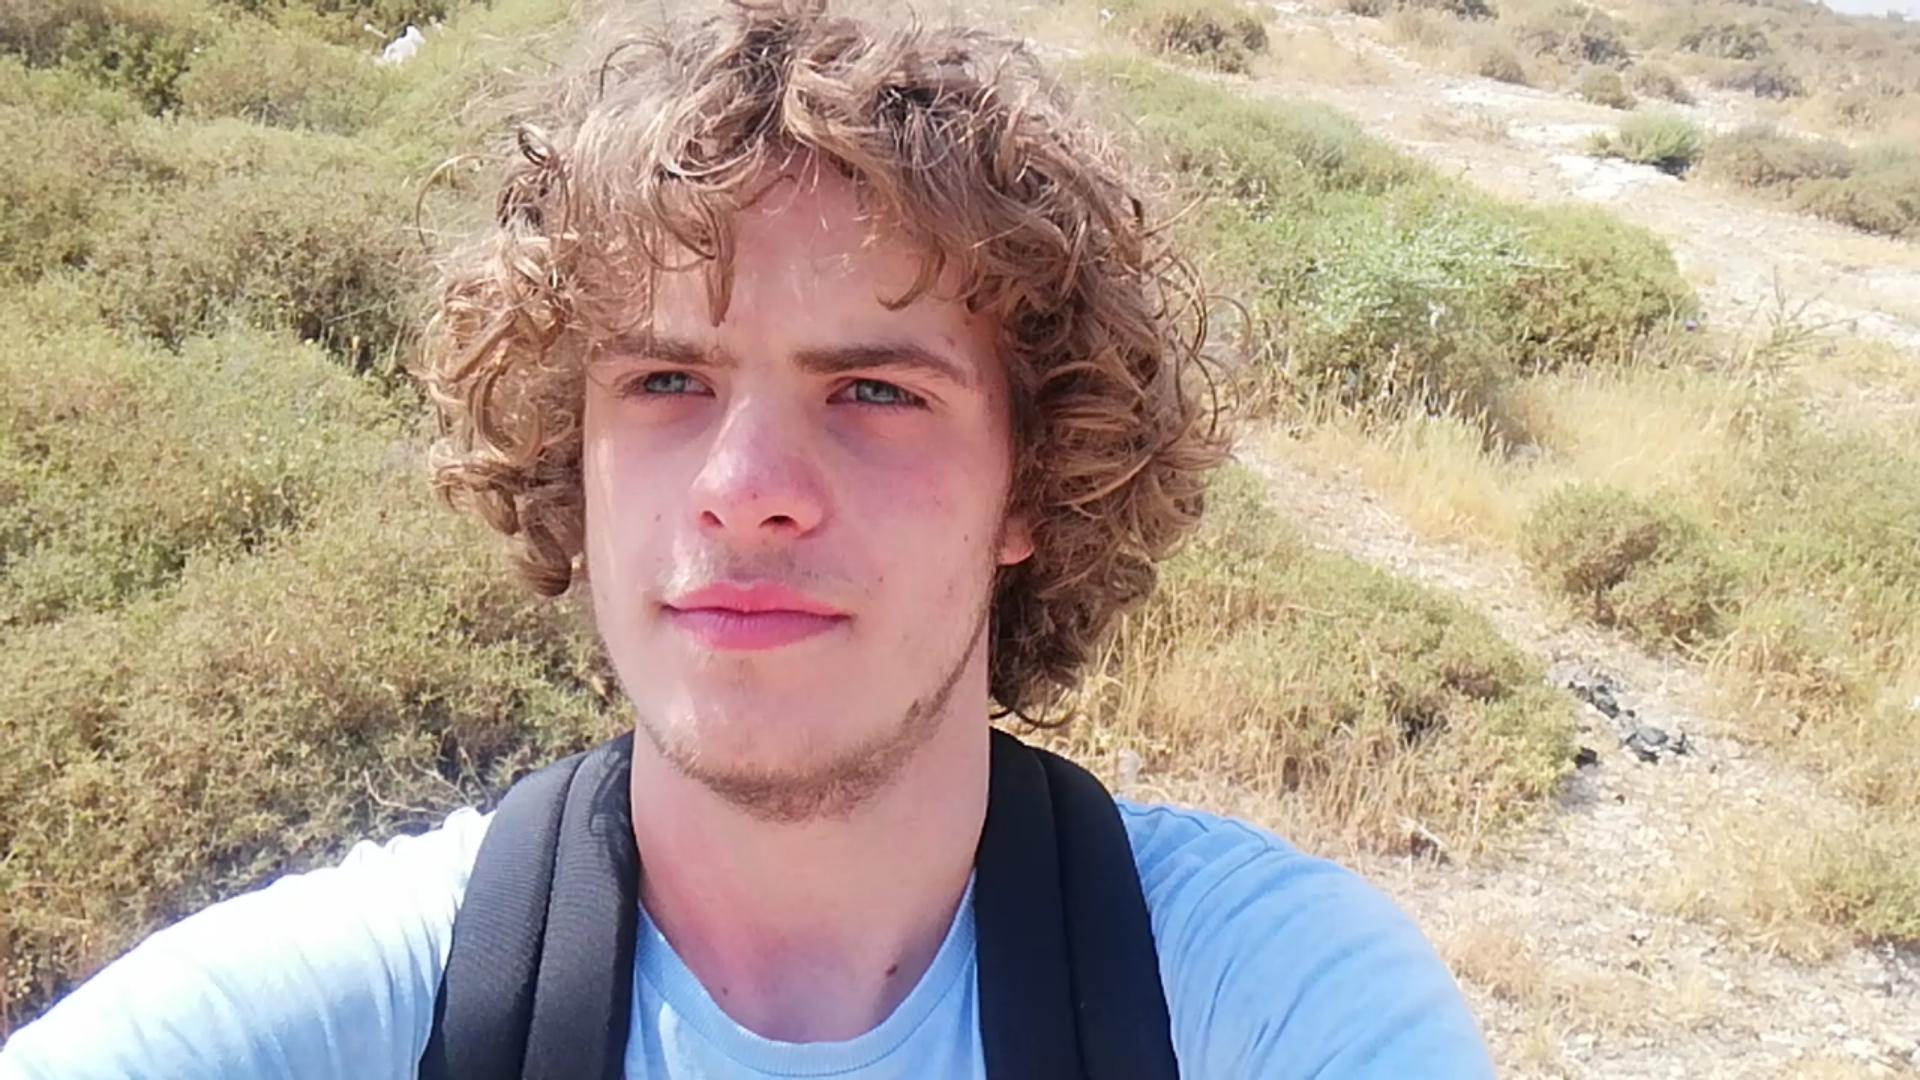 Vlogs van Thomas langs projecten in Jordanië